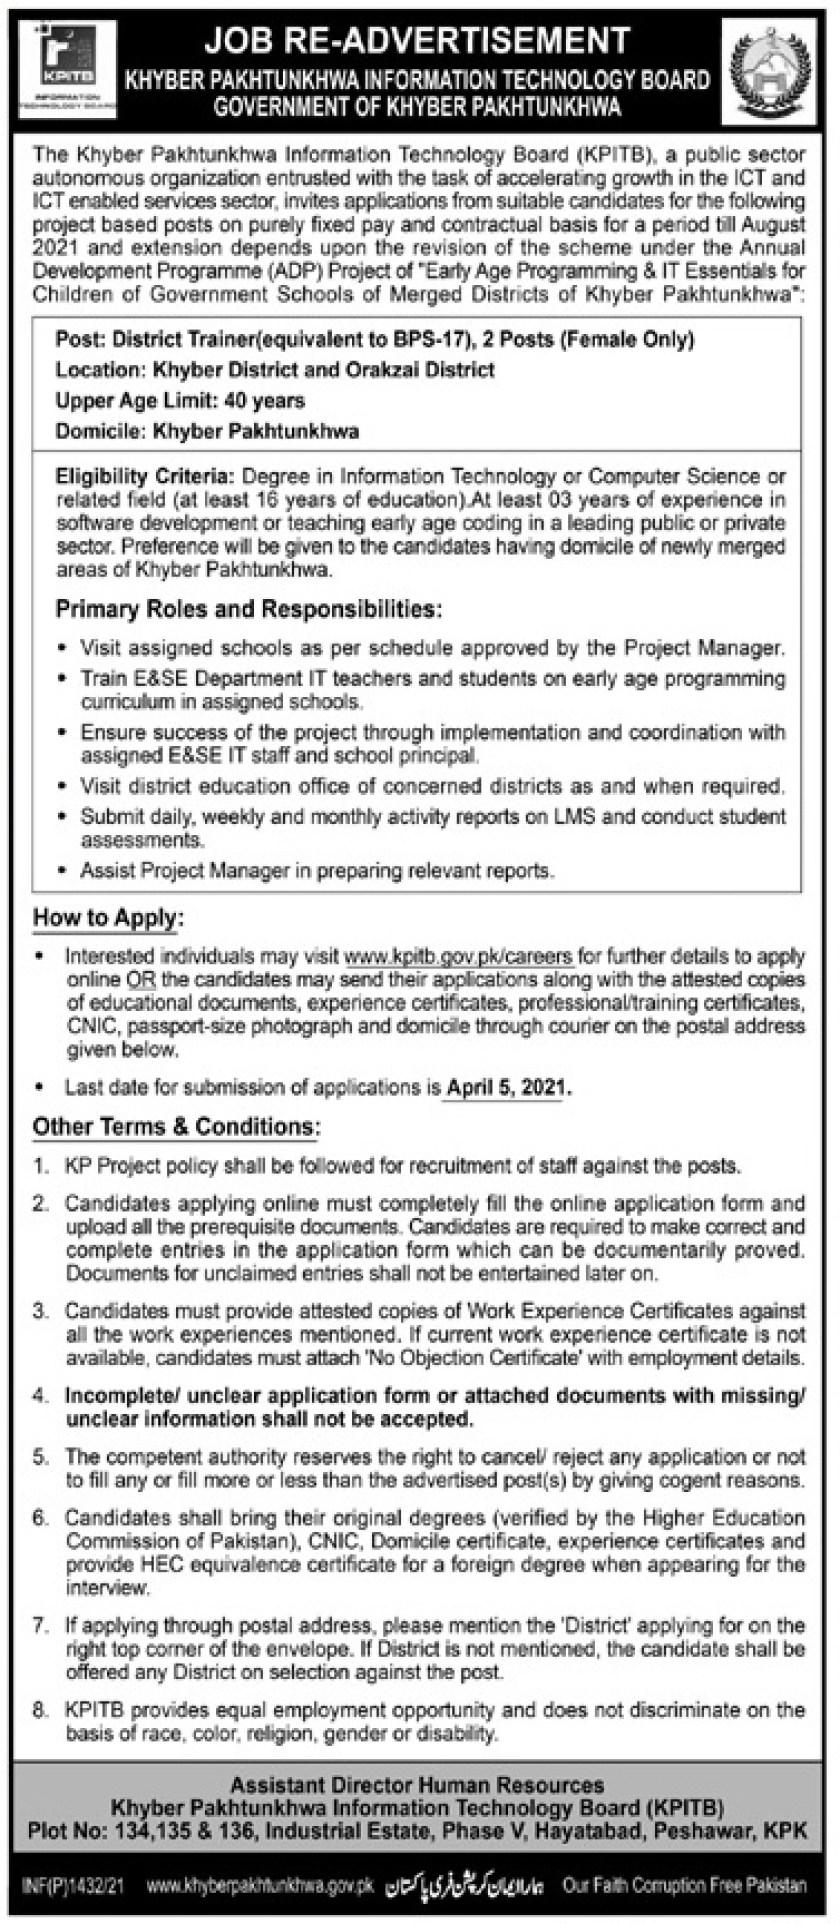 Khyber Pakhtunkhwa Information Technology Board KPITB Jobs 2021